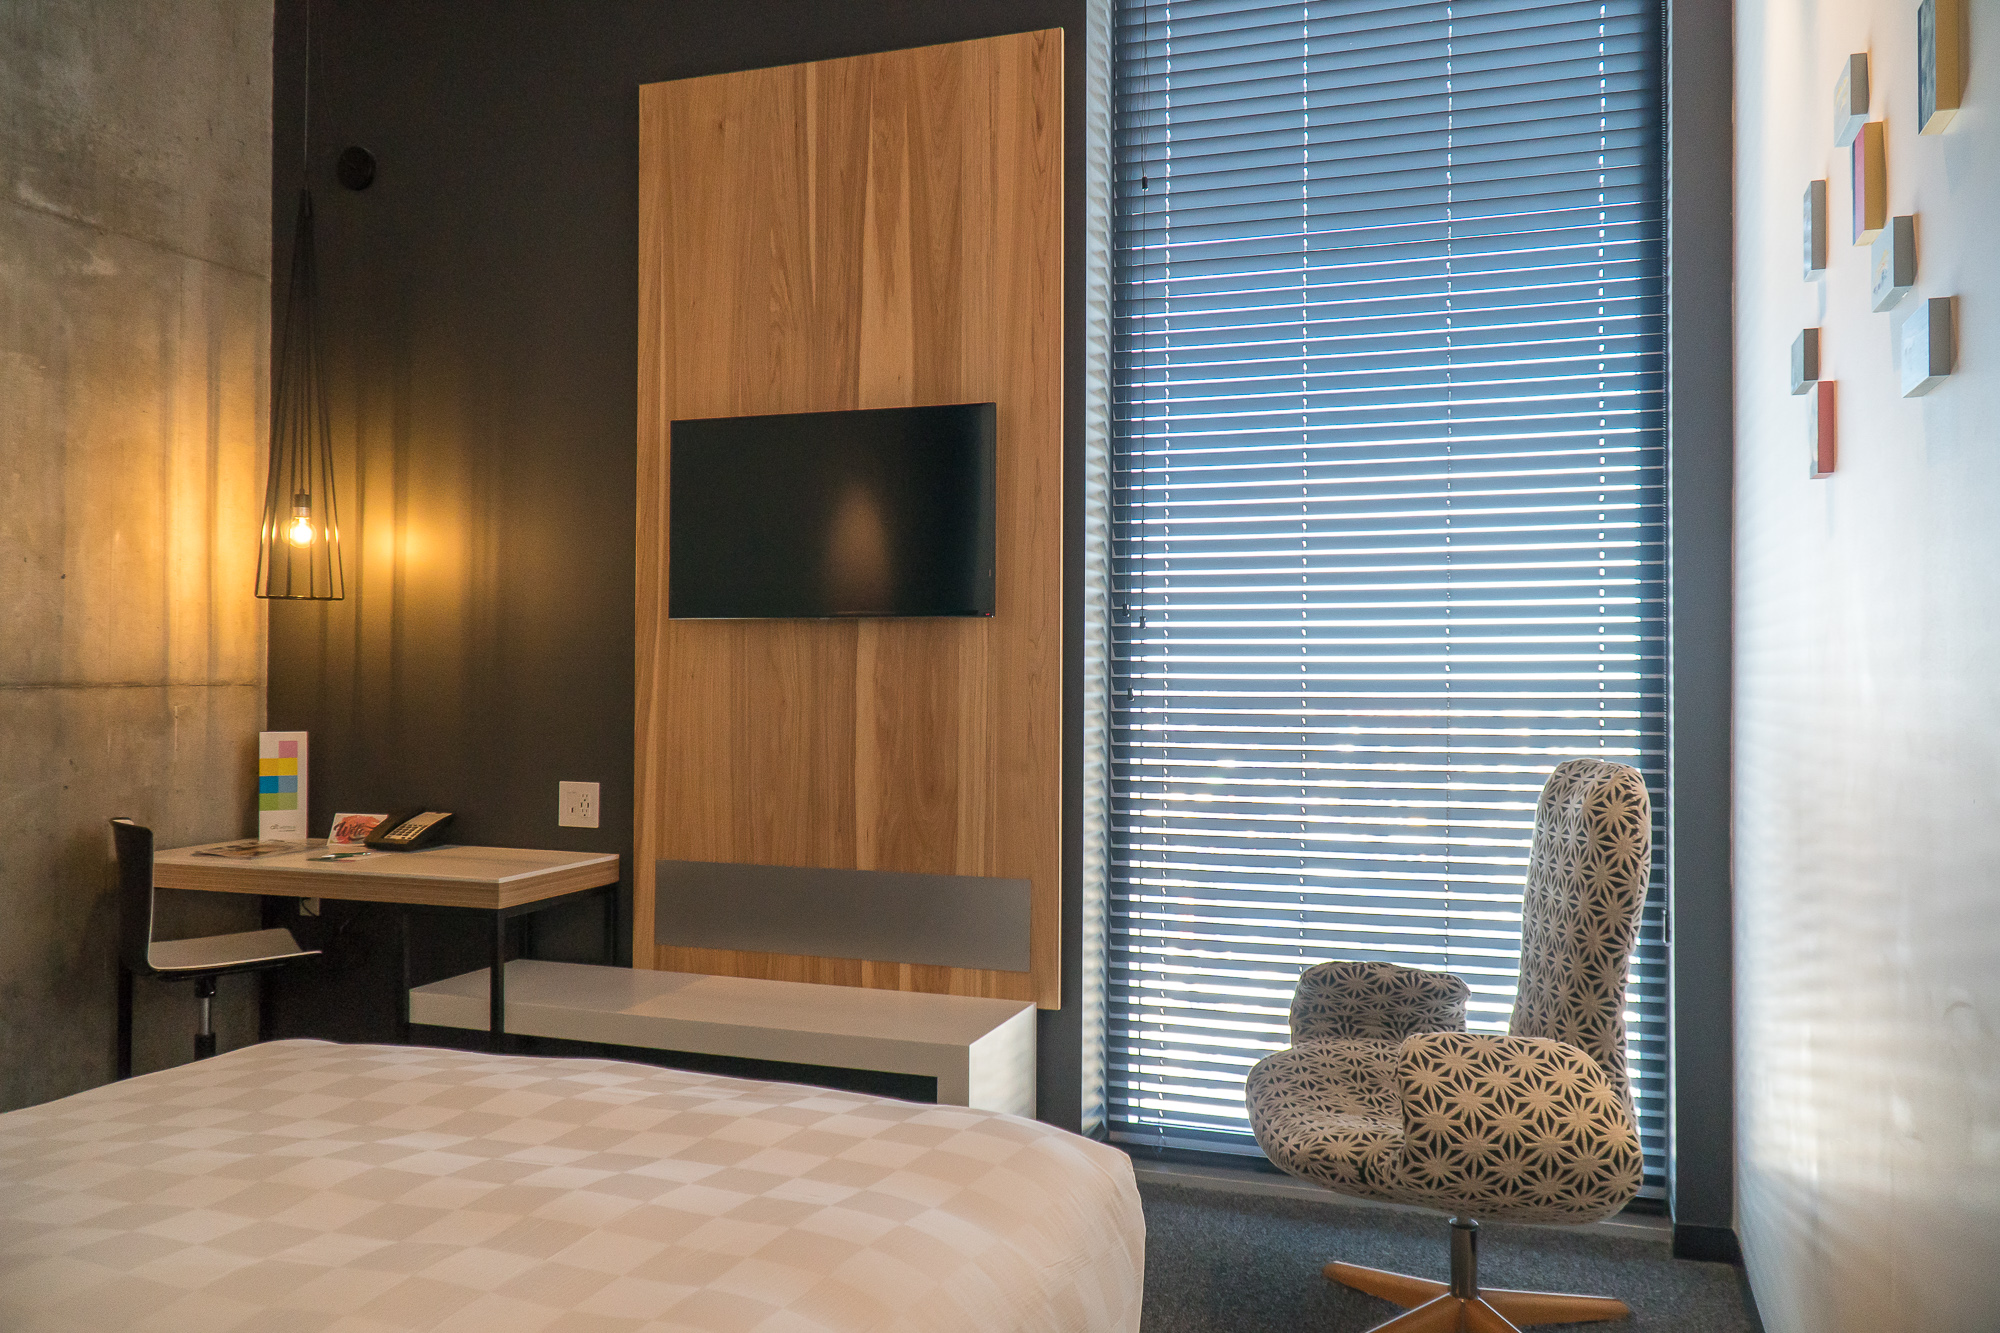 Chambre et vue du Alt Hotel Winnipeg